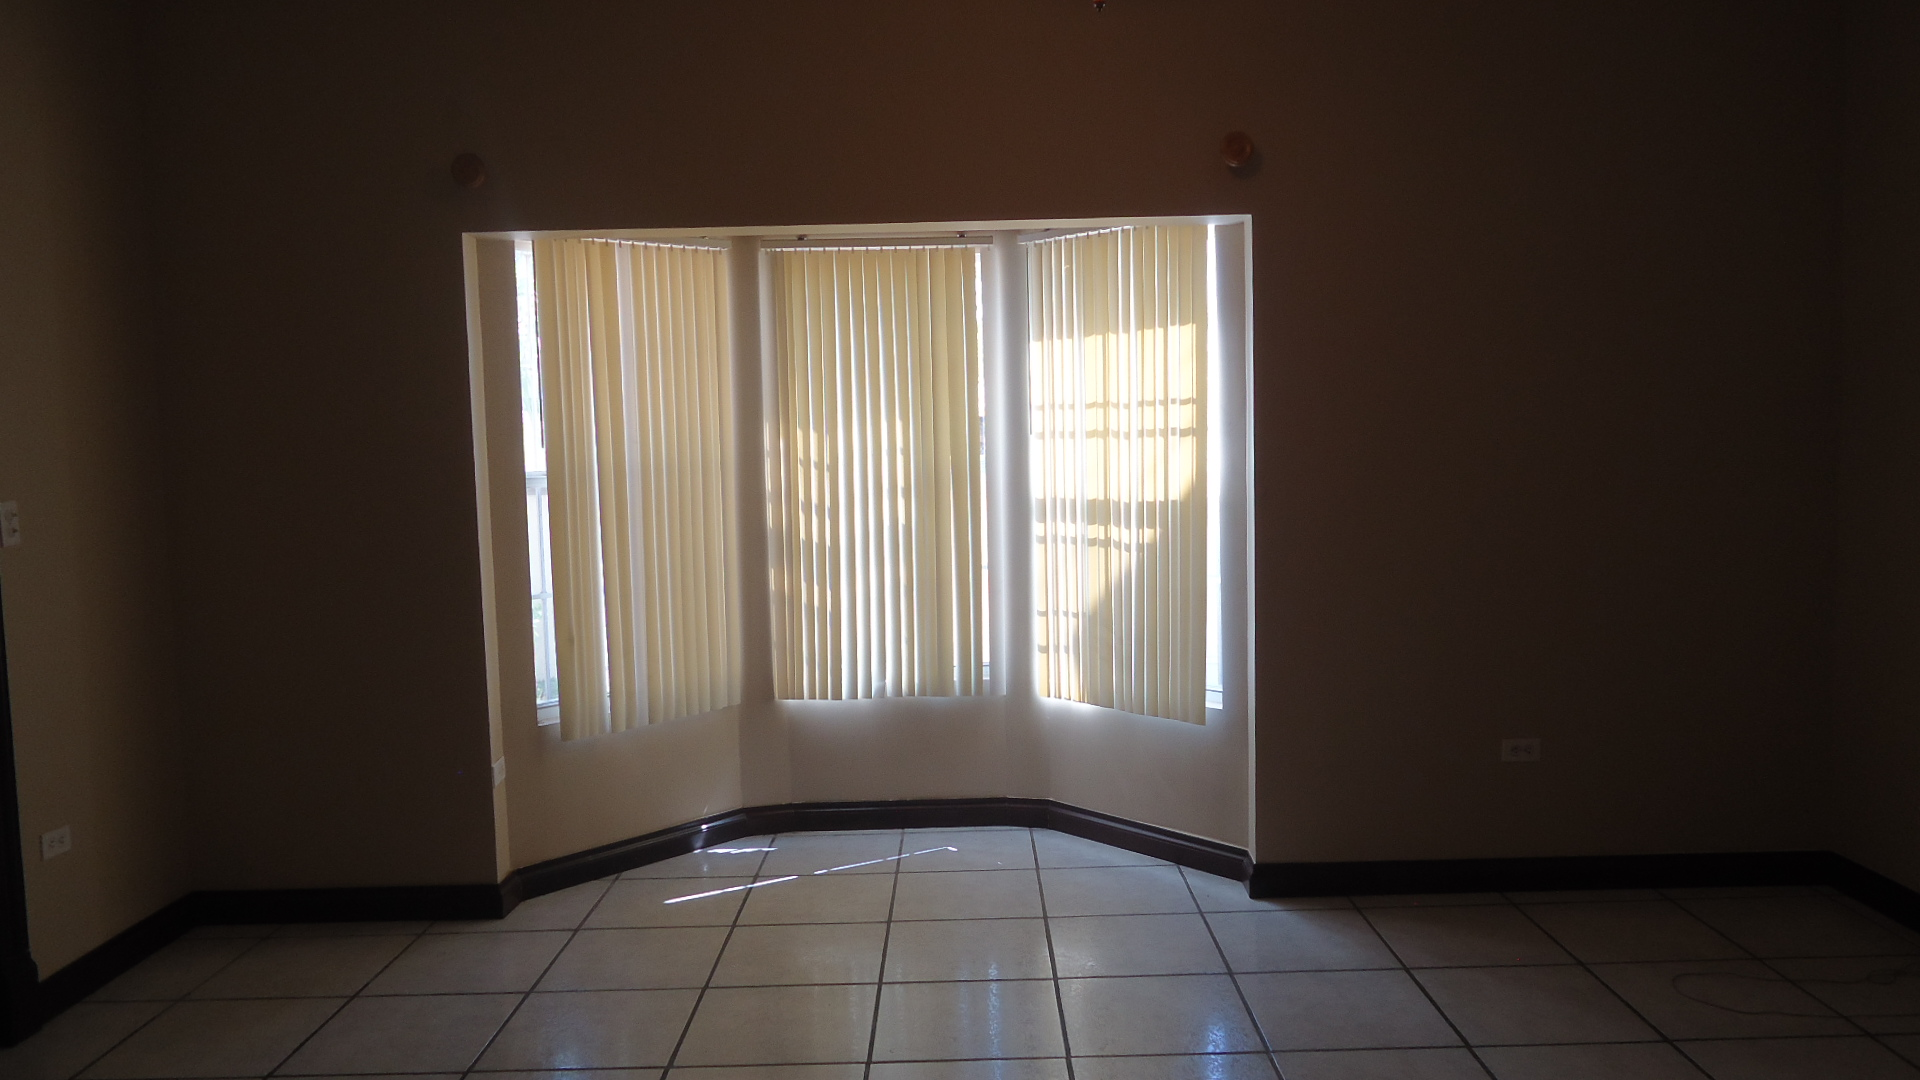 Renta de Casa, Av. Tecnológico #218 Col. Tecnológico, Piedras Negras, Coahuila. (RC #51)